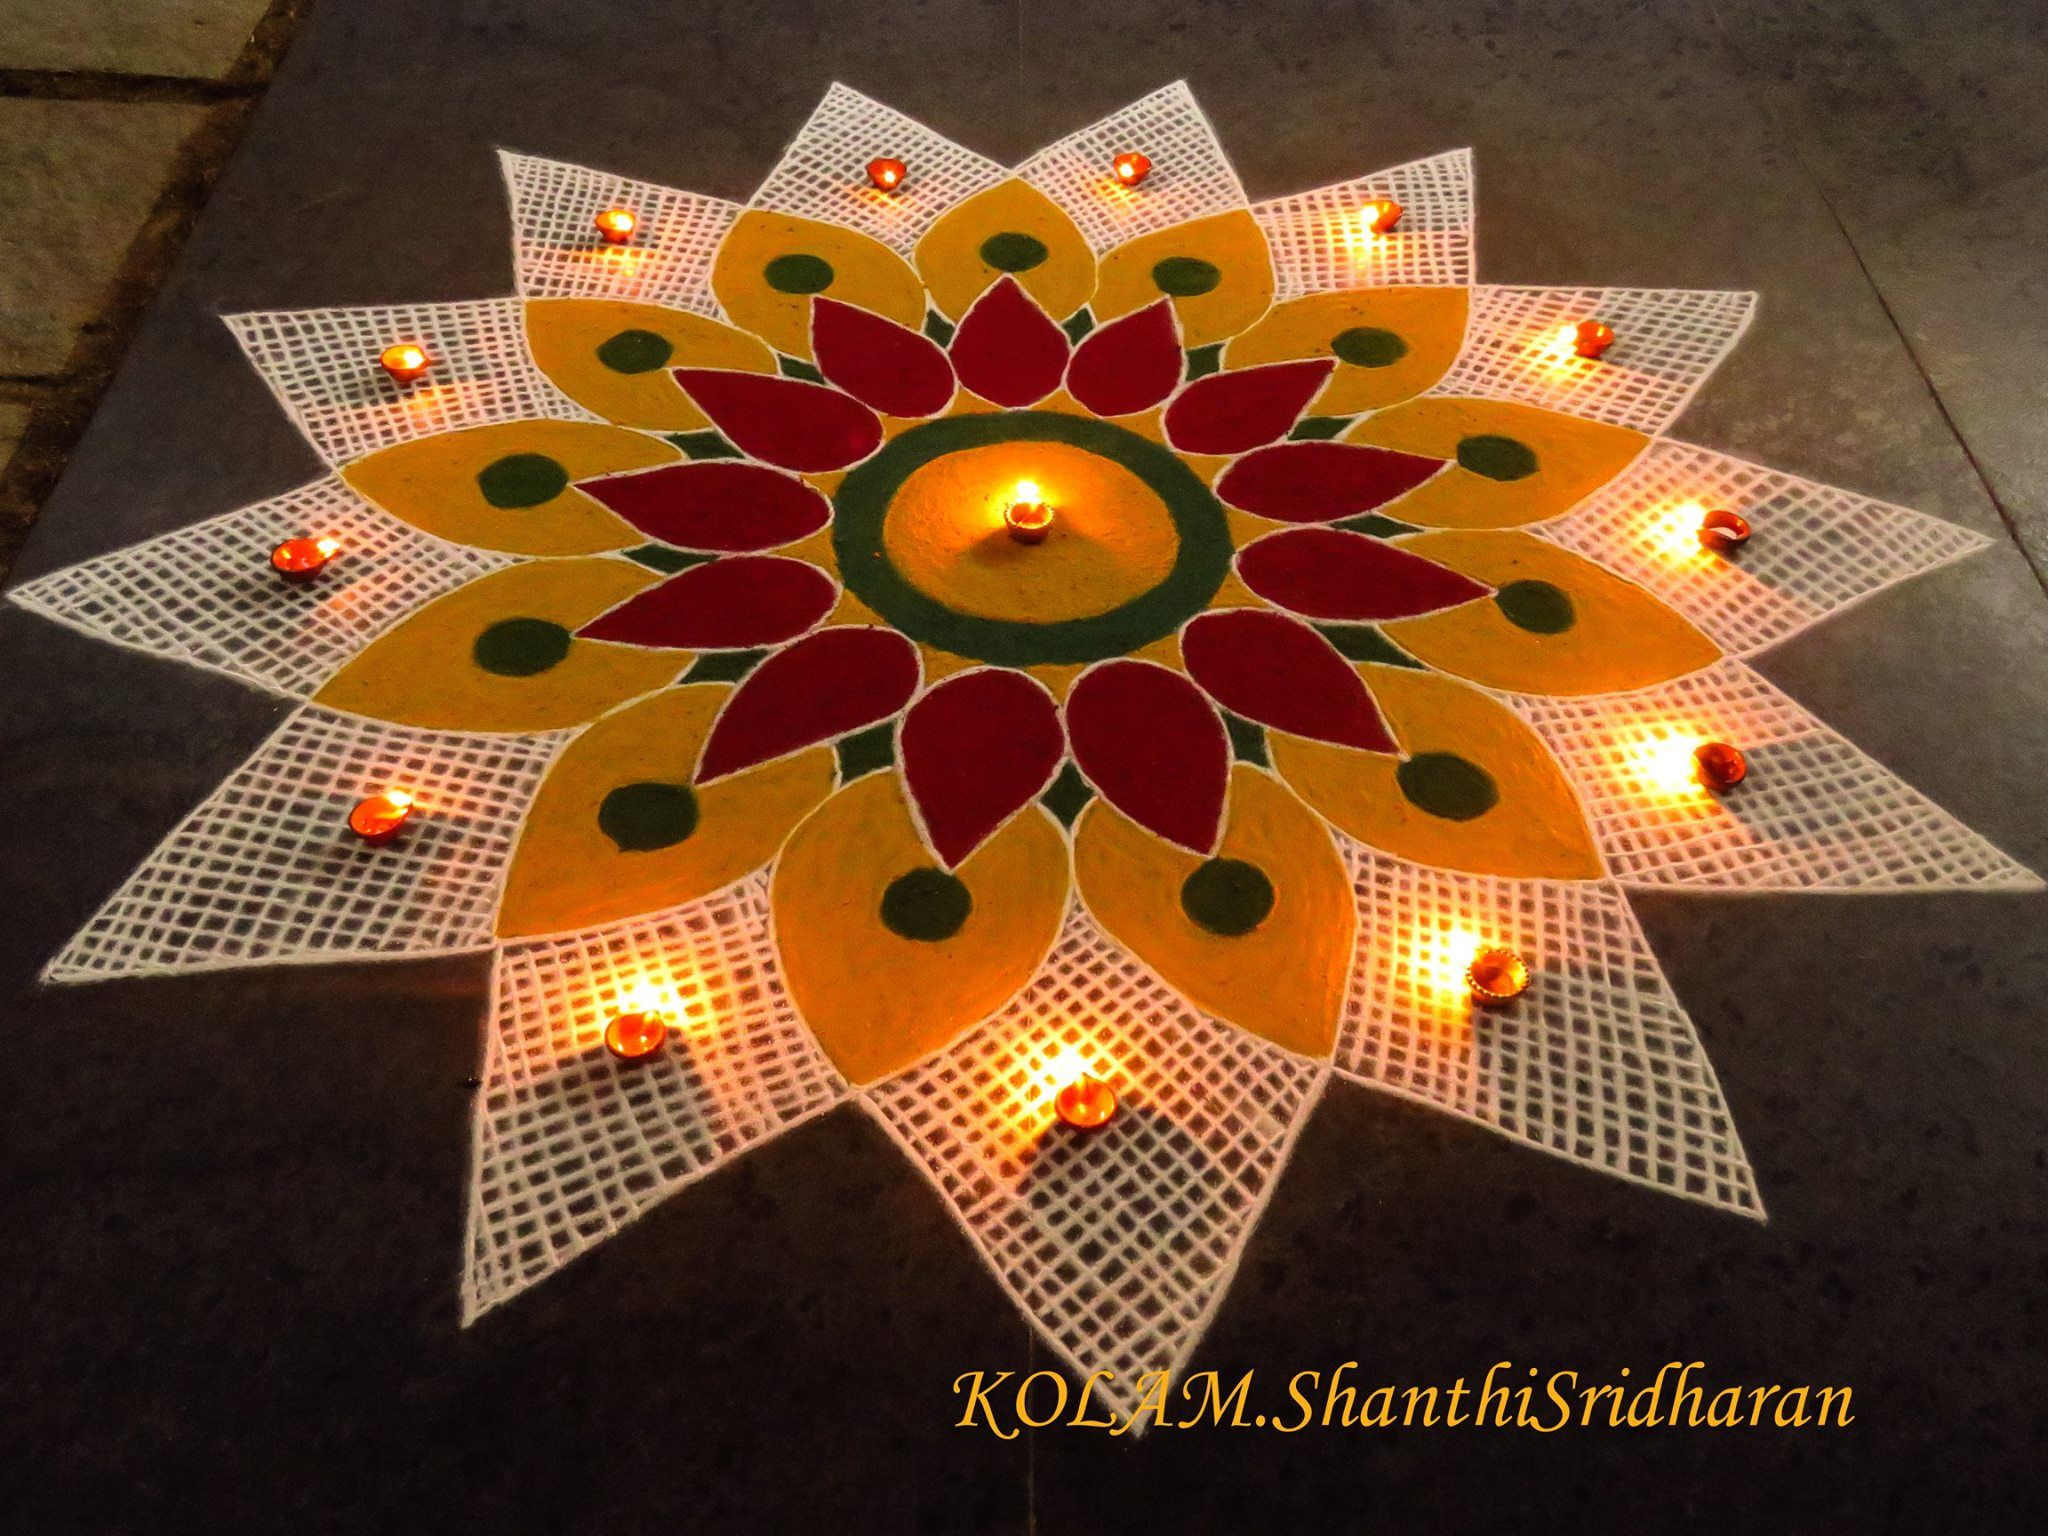 Pin by Shanthi Sridharan.KOLAM on Mandala | Pinterest | Rangoli ... for Flower Rangoli Designs For Diwali  35fsj